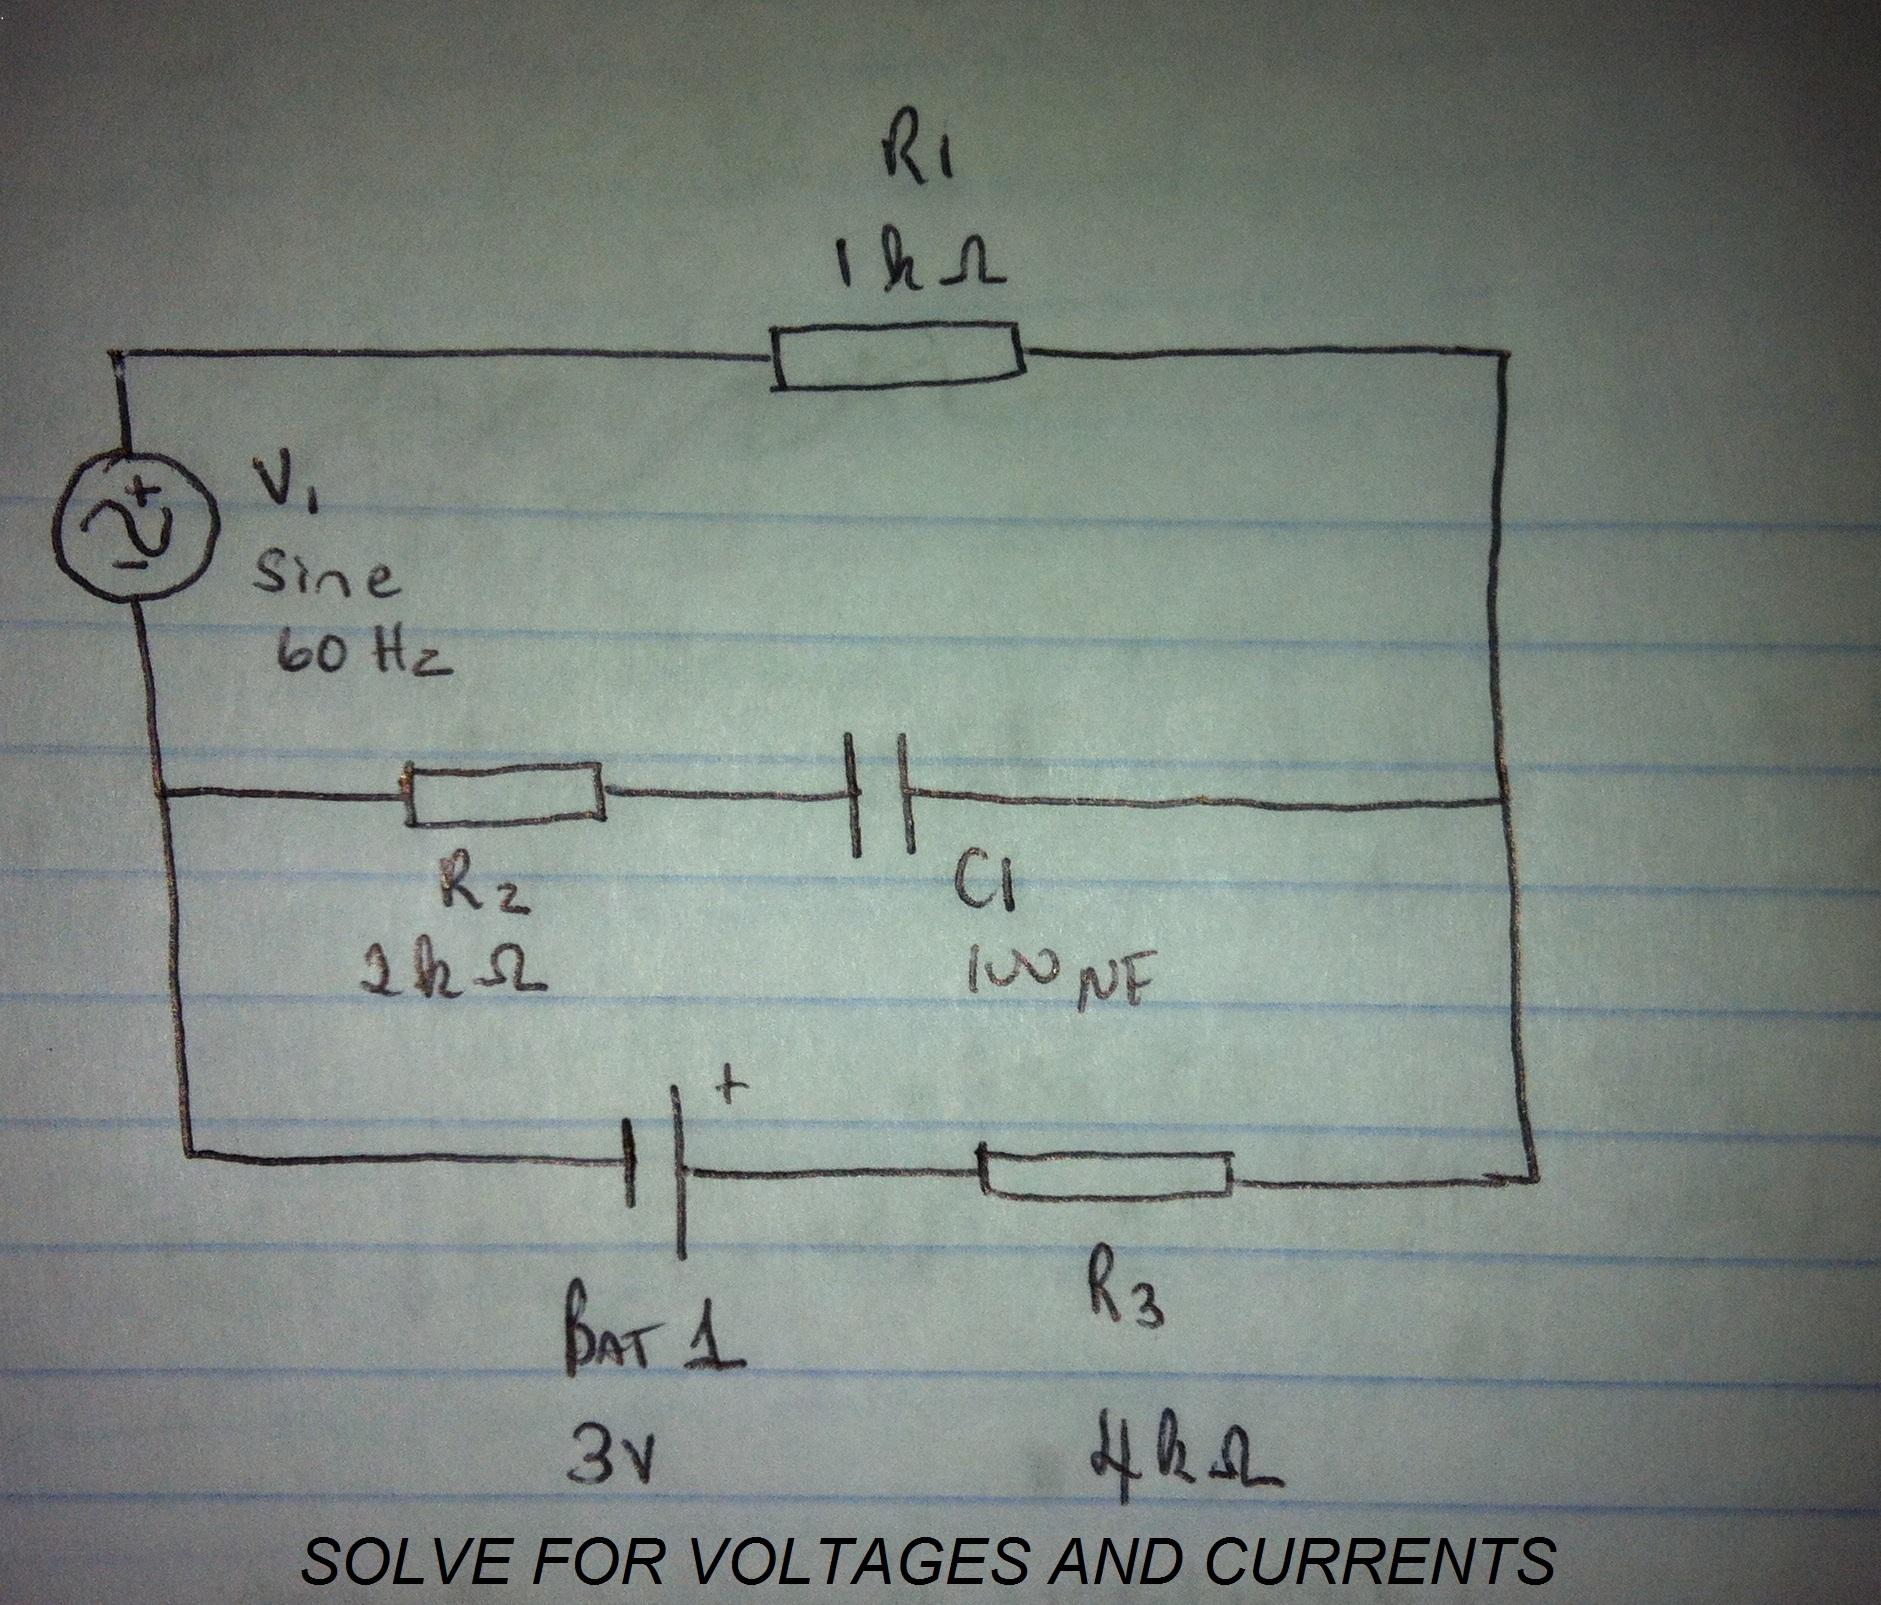 circuitimage.jpg